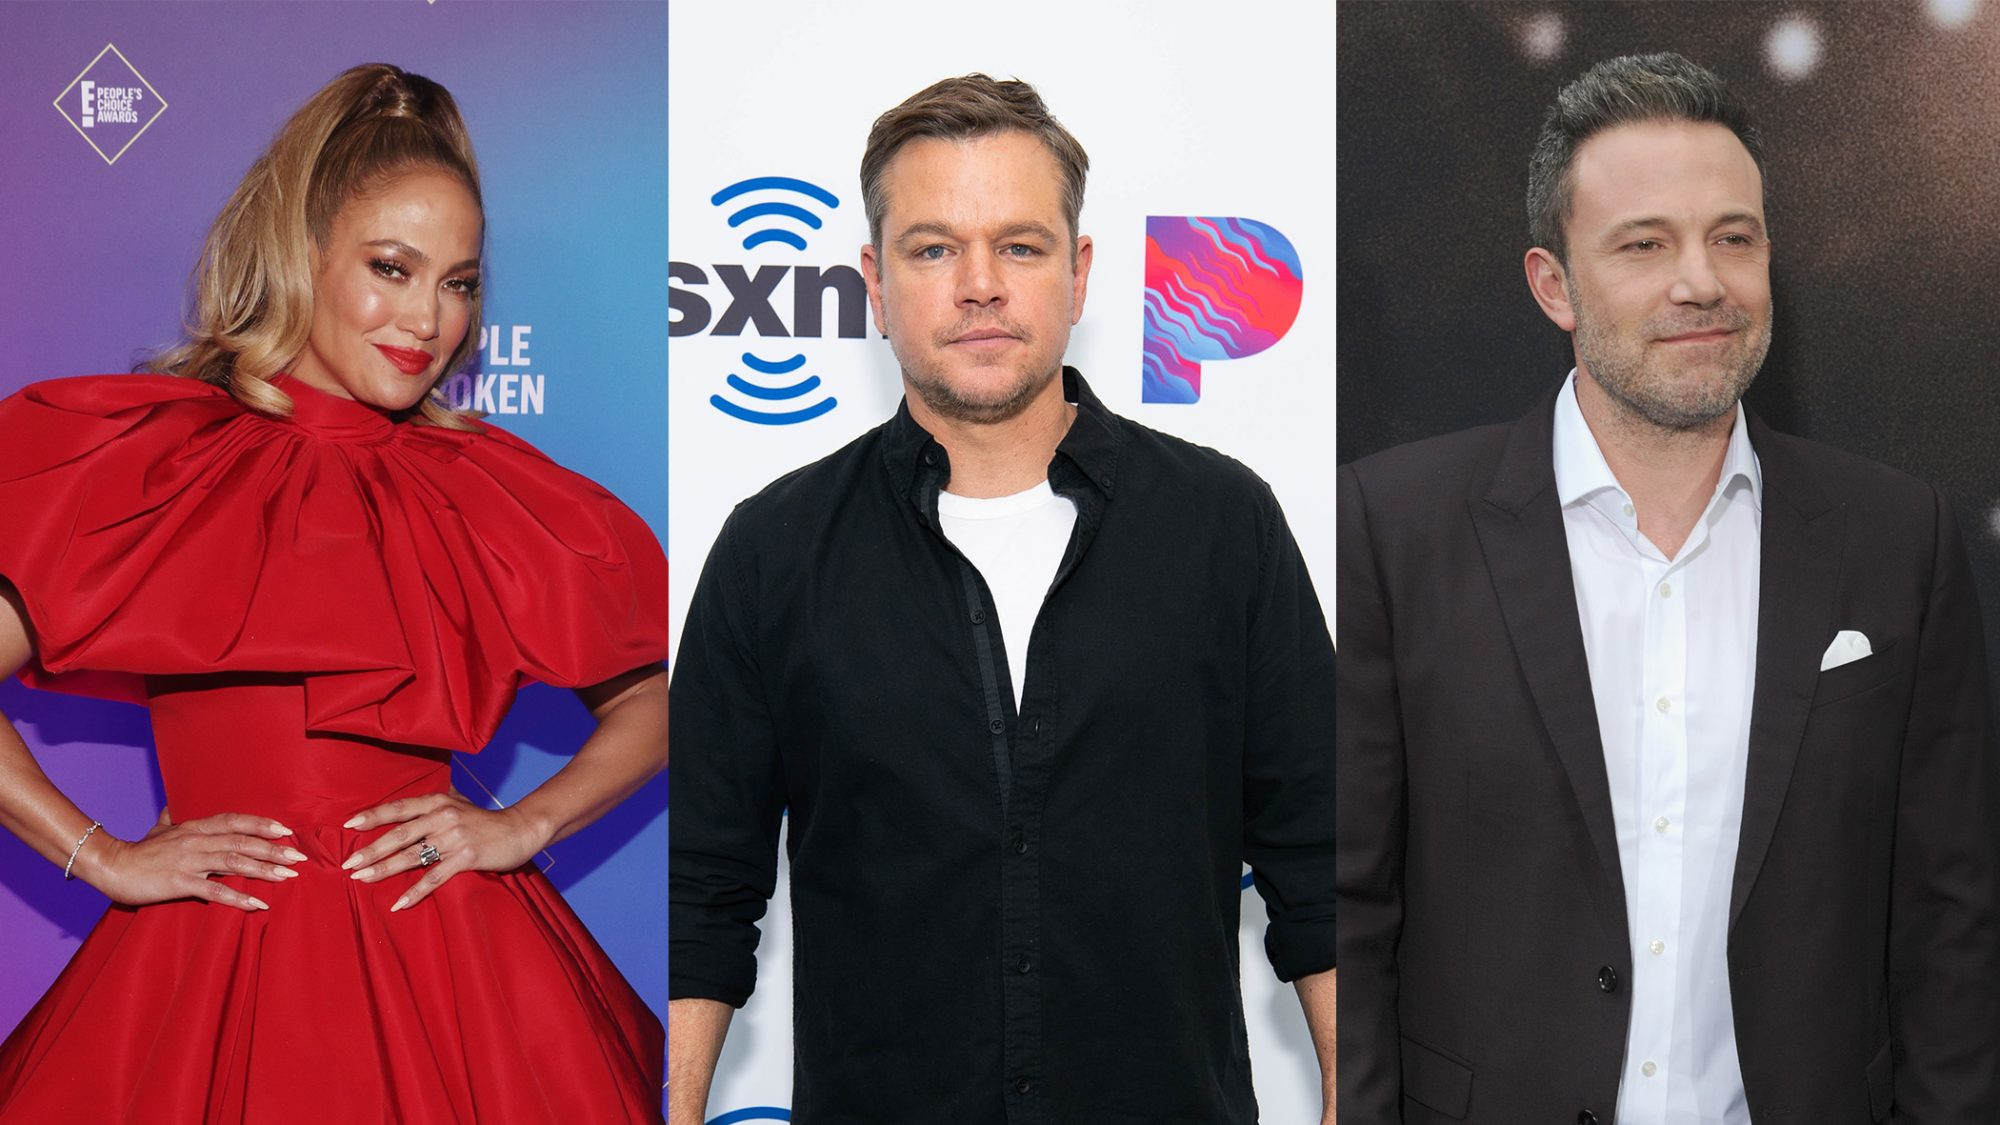 Jennifer Lopez, Matt Damon, and Ben Affleck